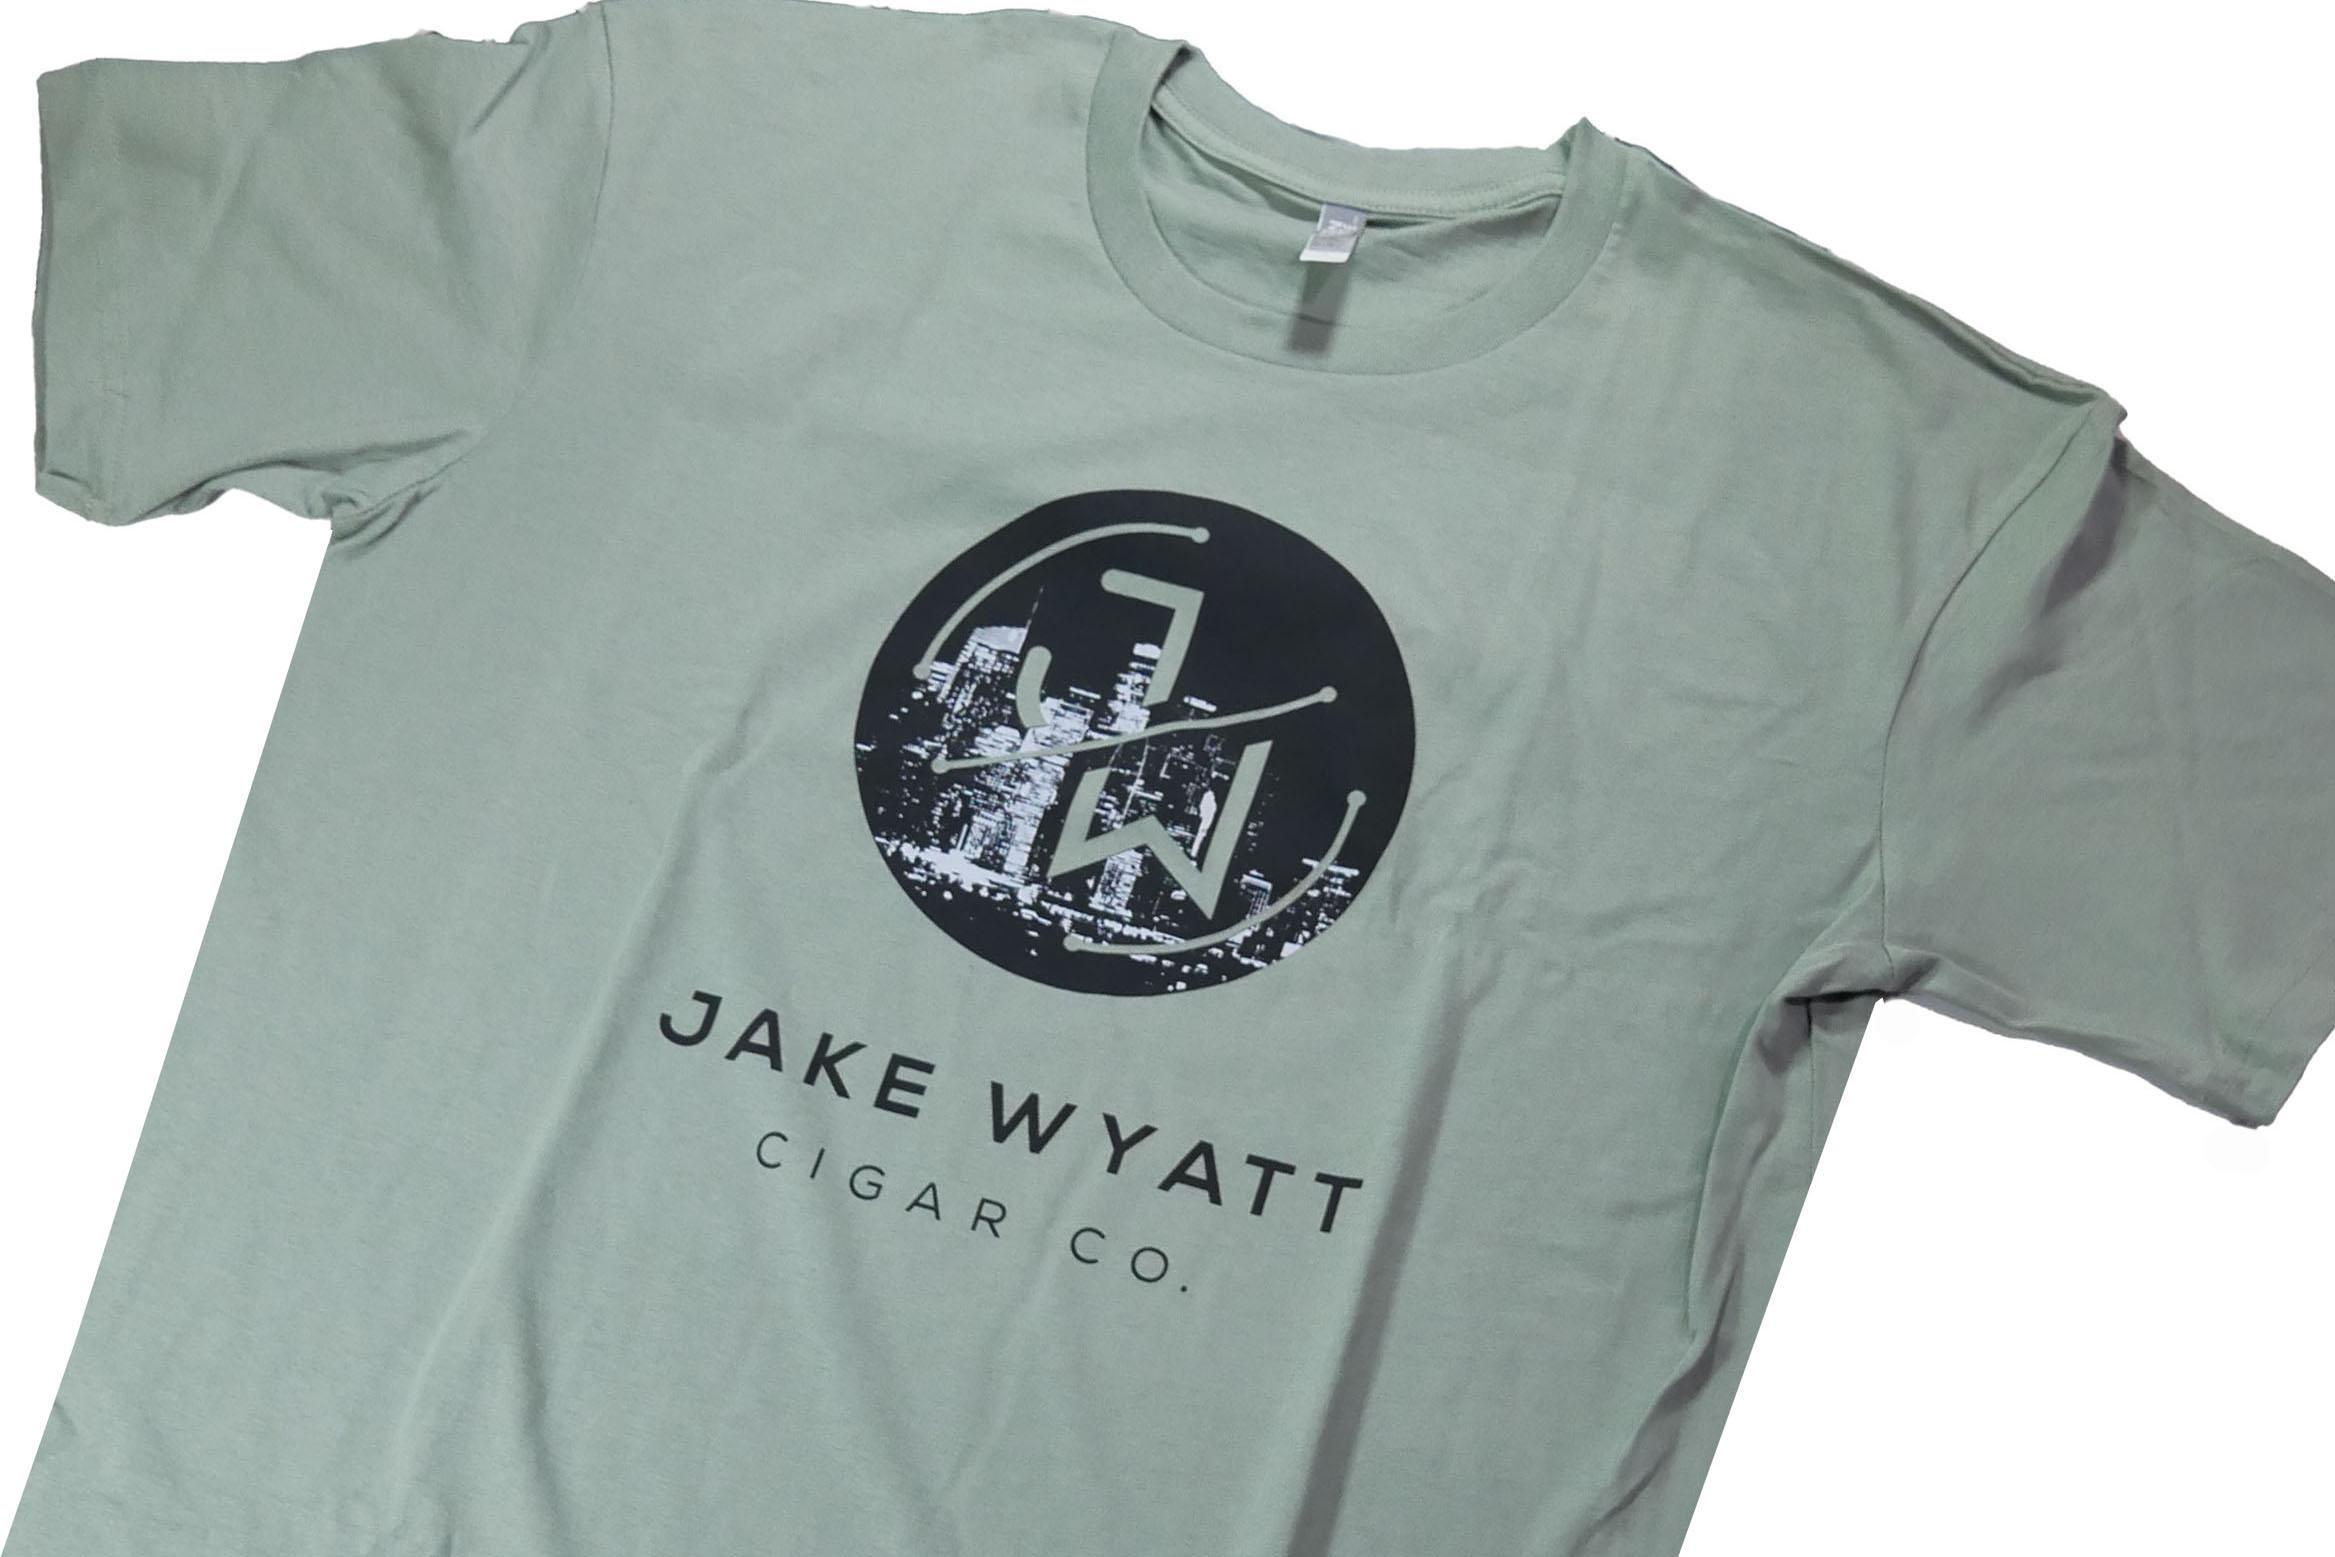 Jake Wyatt Cigar Co. T-Shirt - City Scape